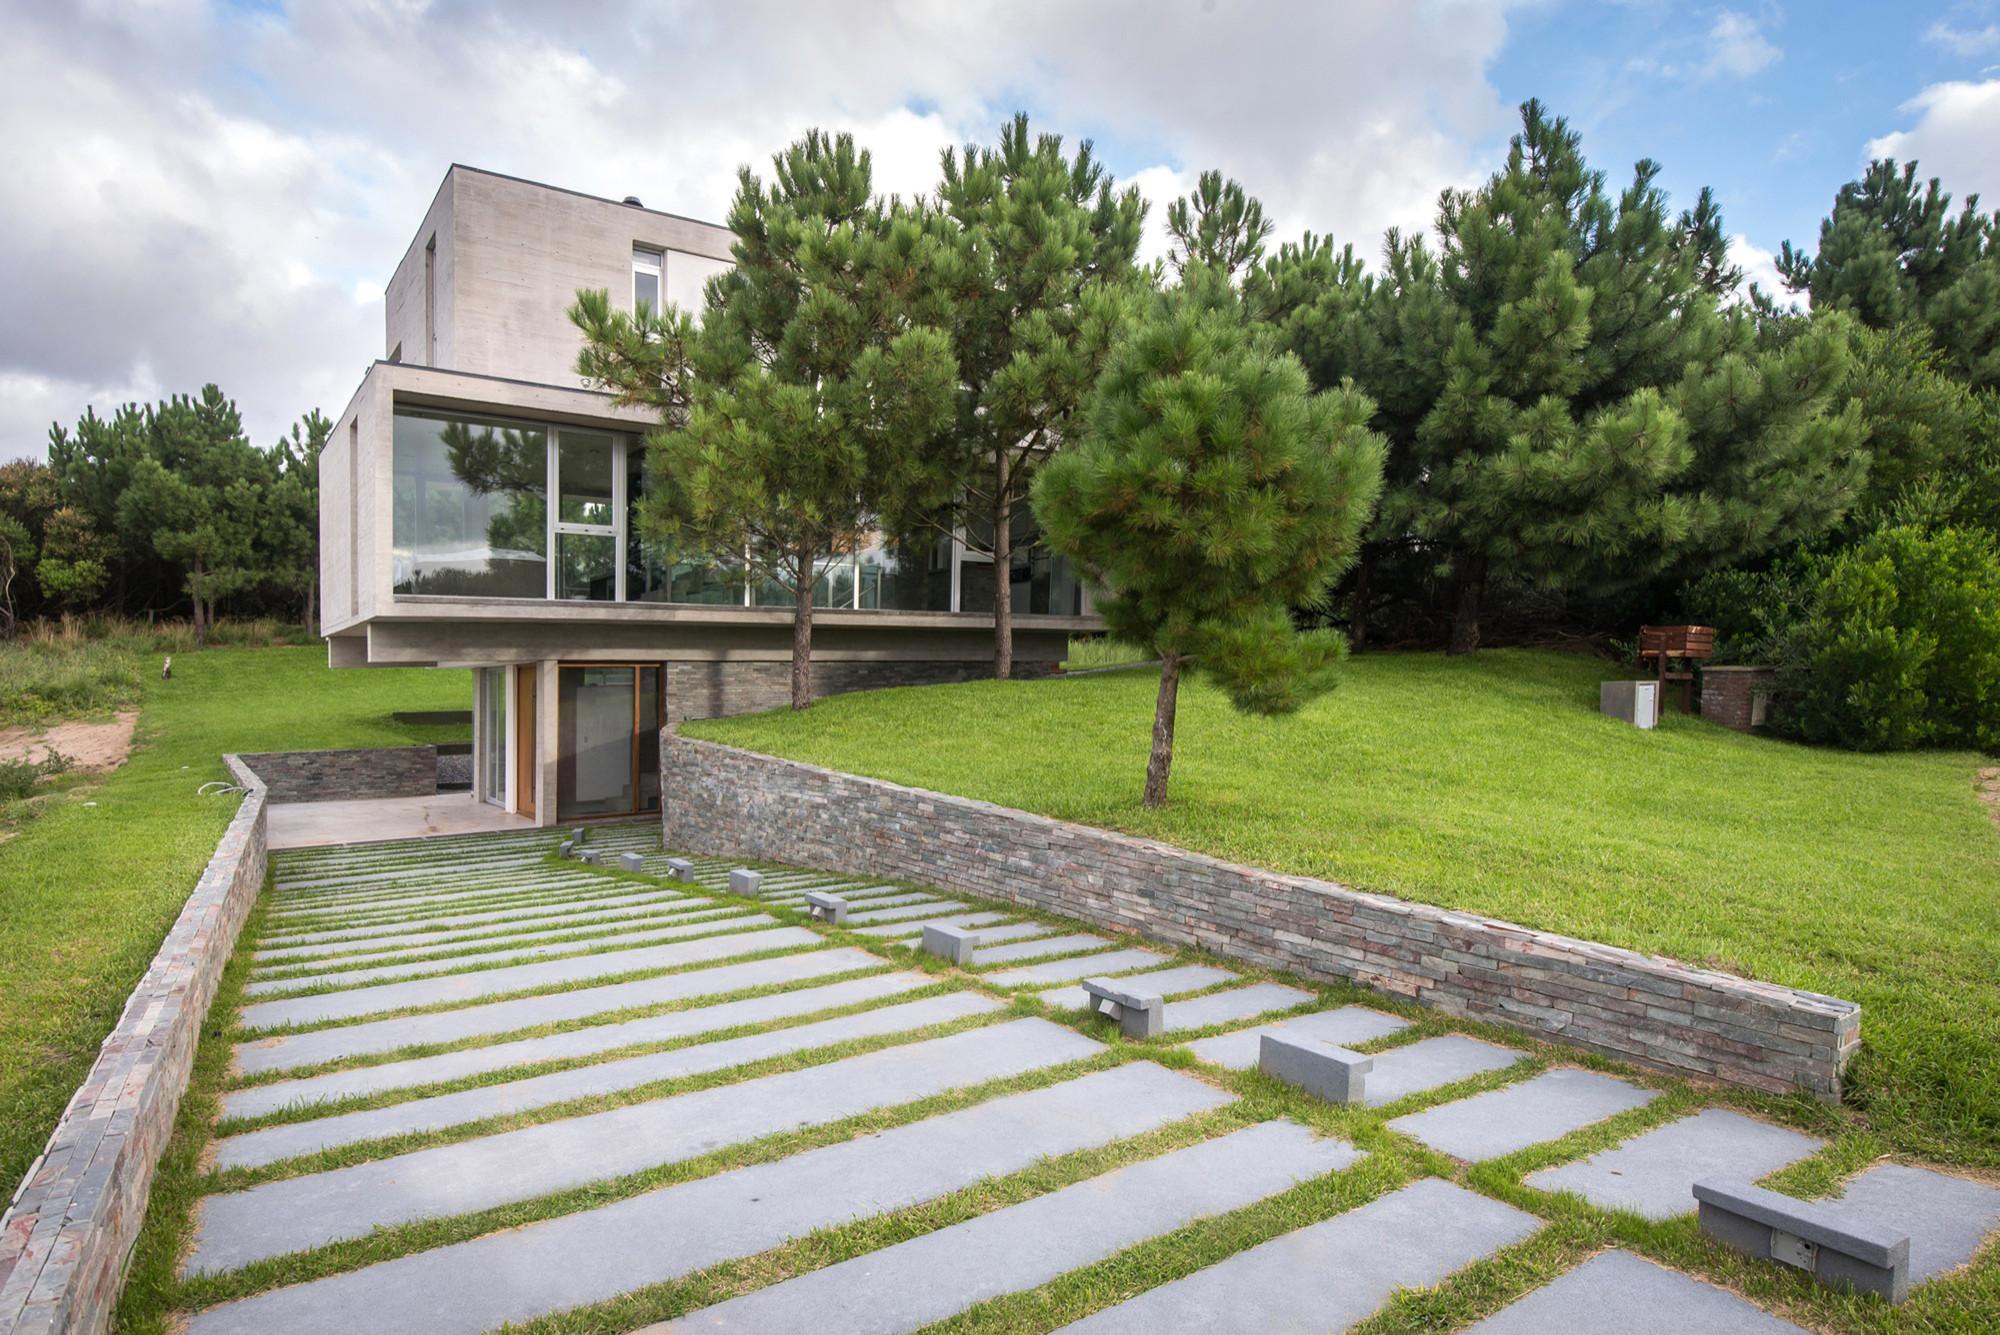 KVS House / Estudio Galera, © Diego Medina